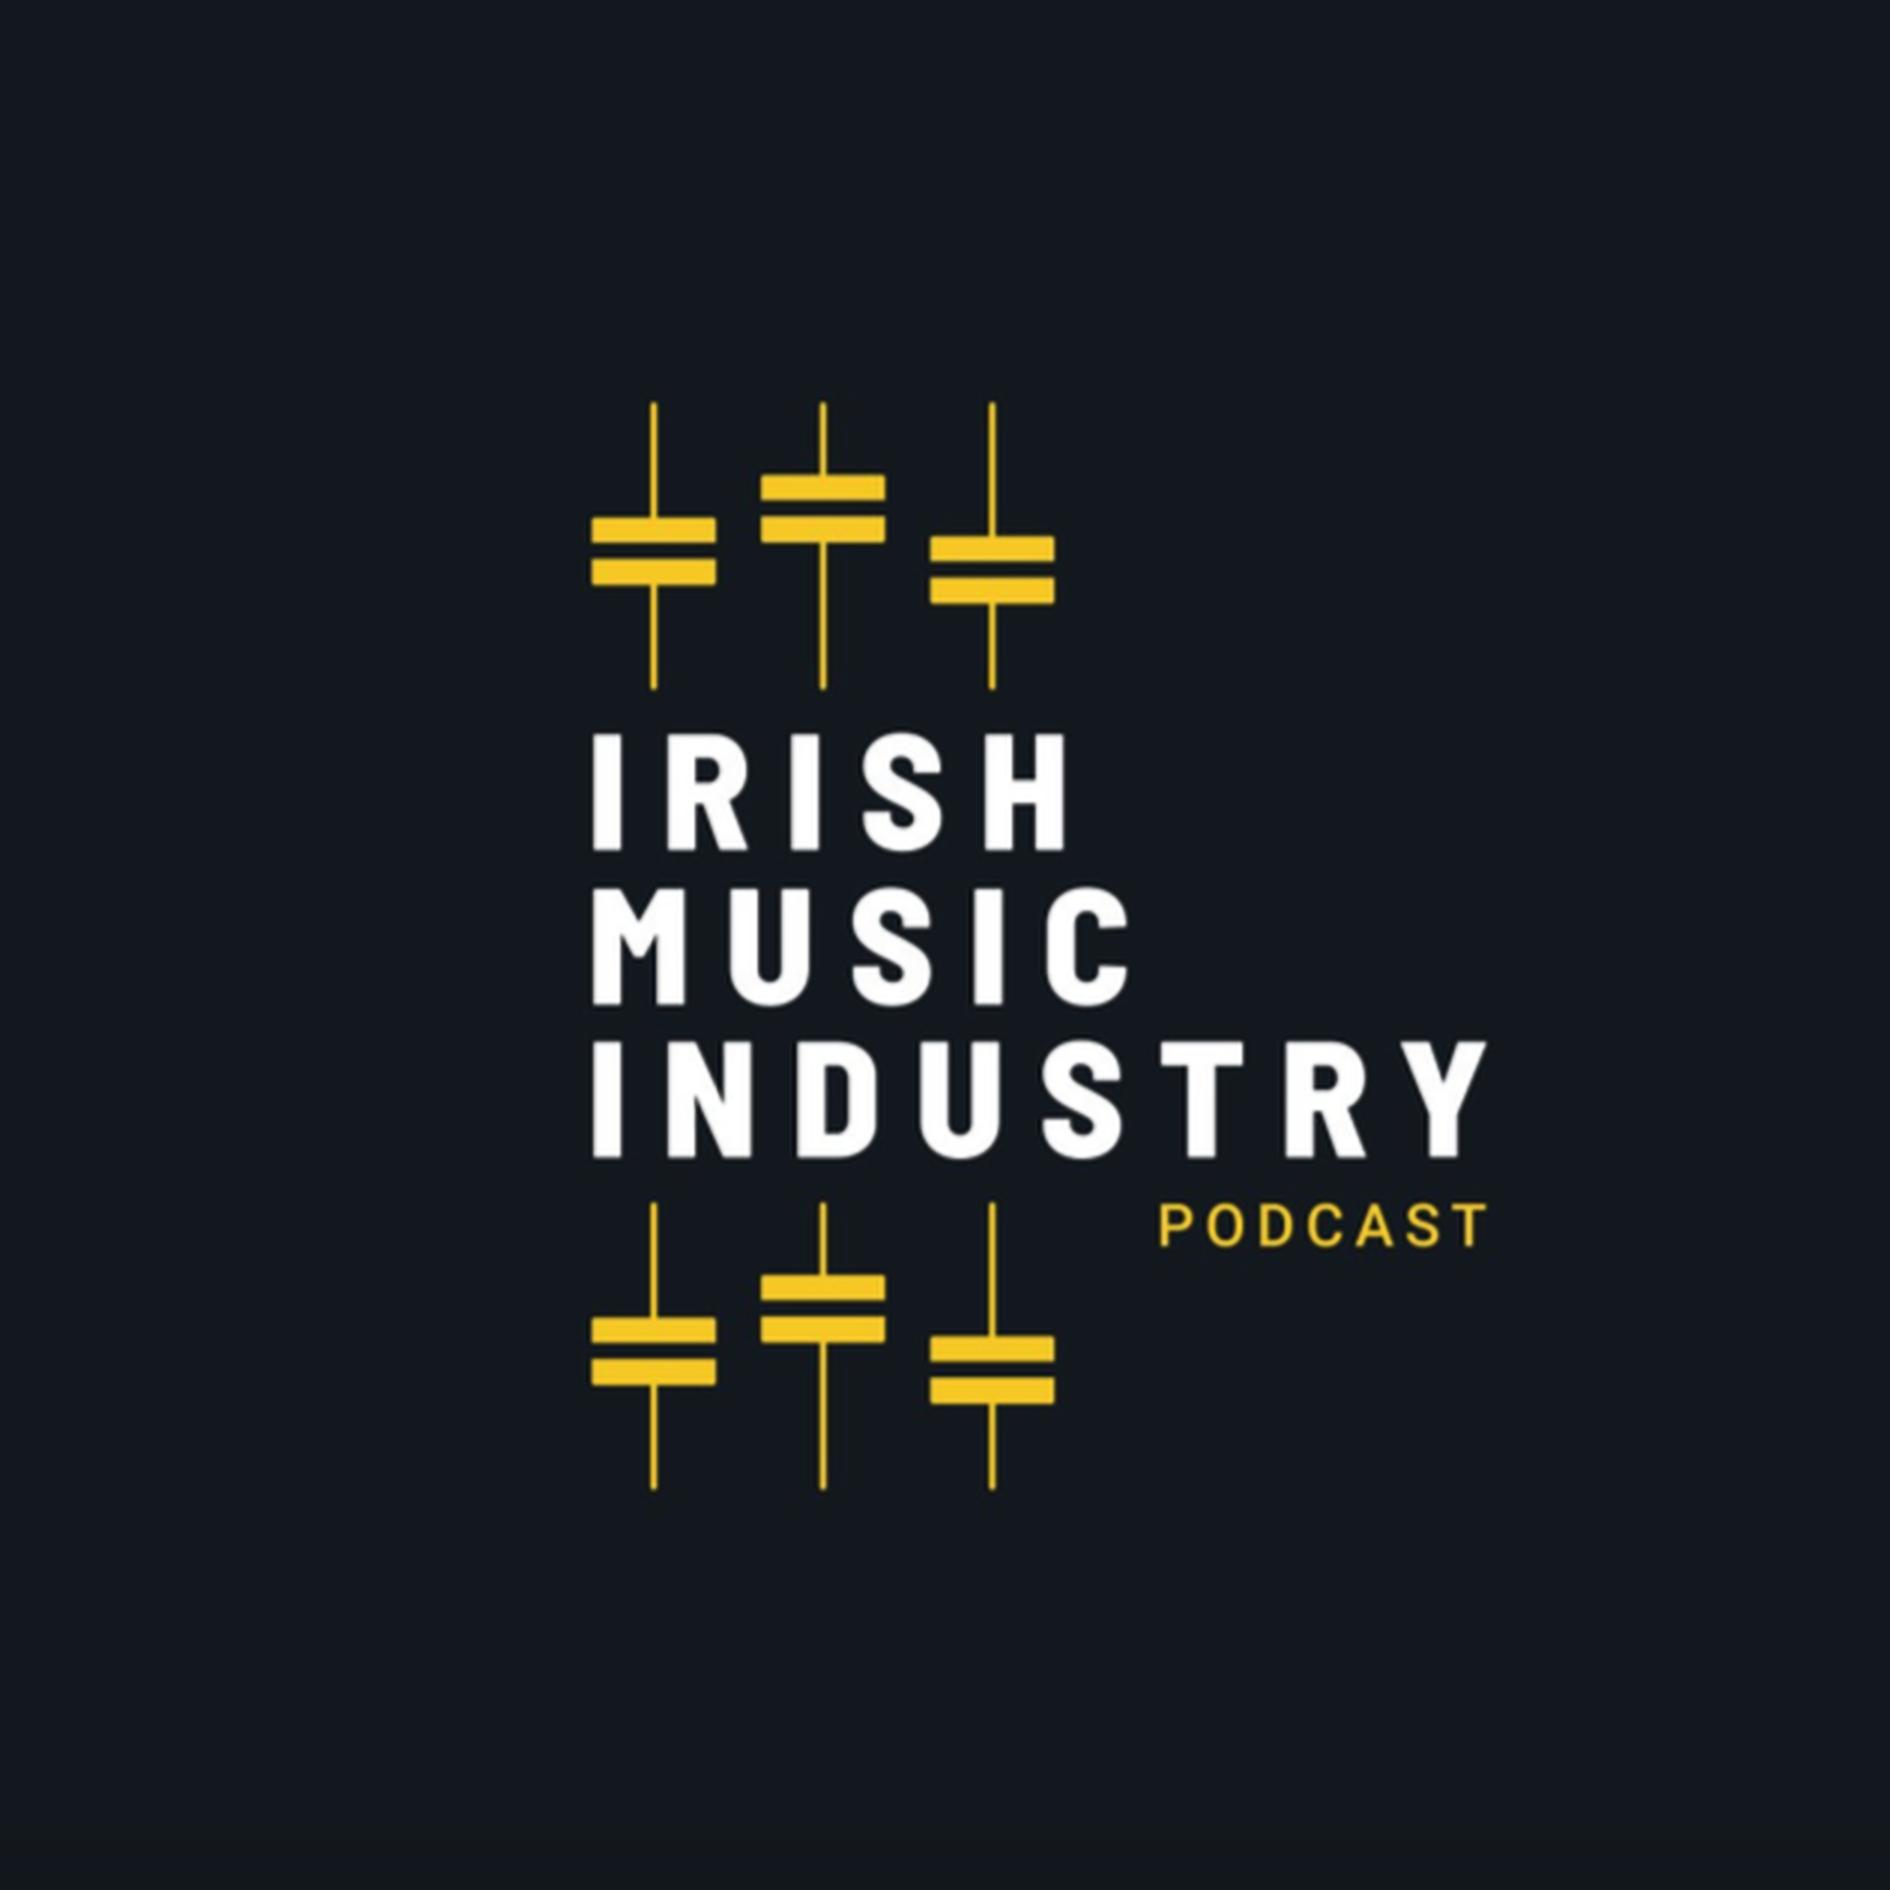 The Irish Music Industry Podcast show art